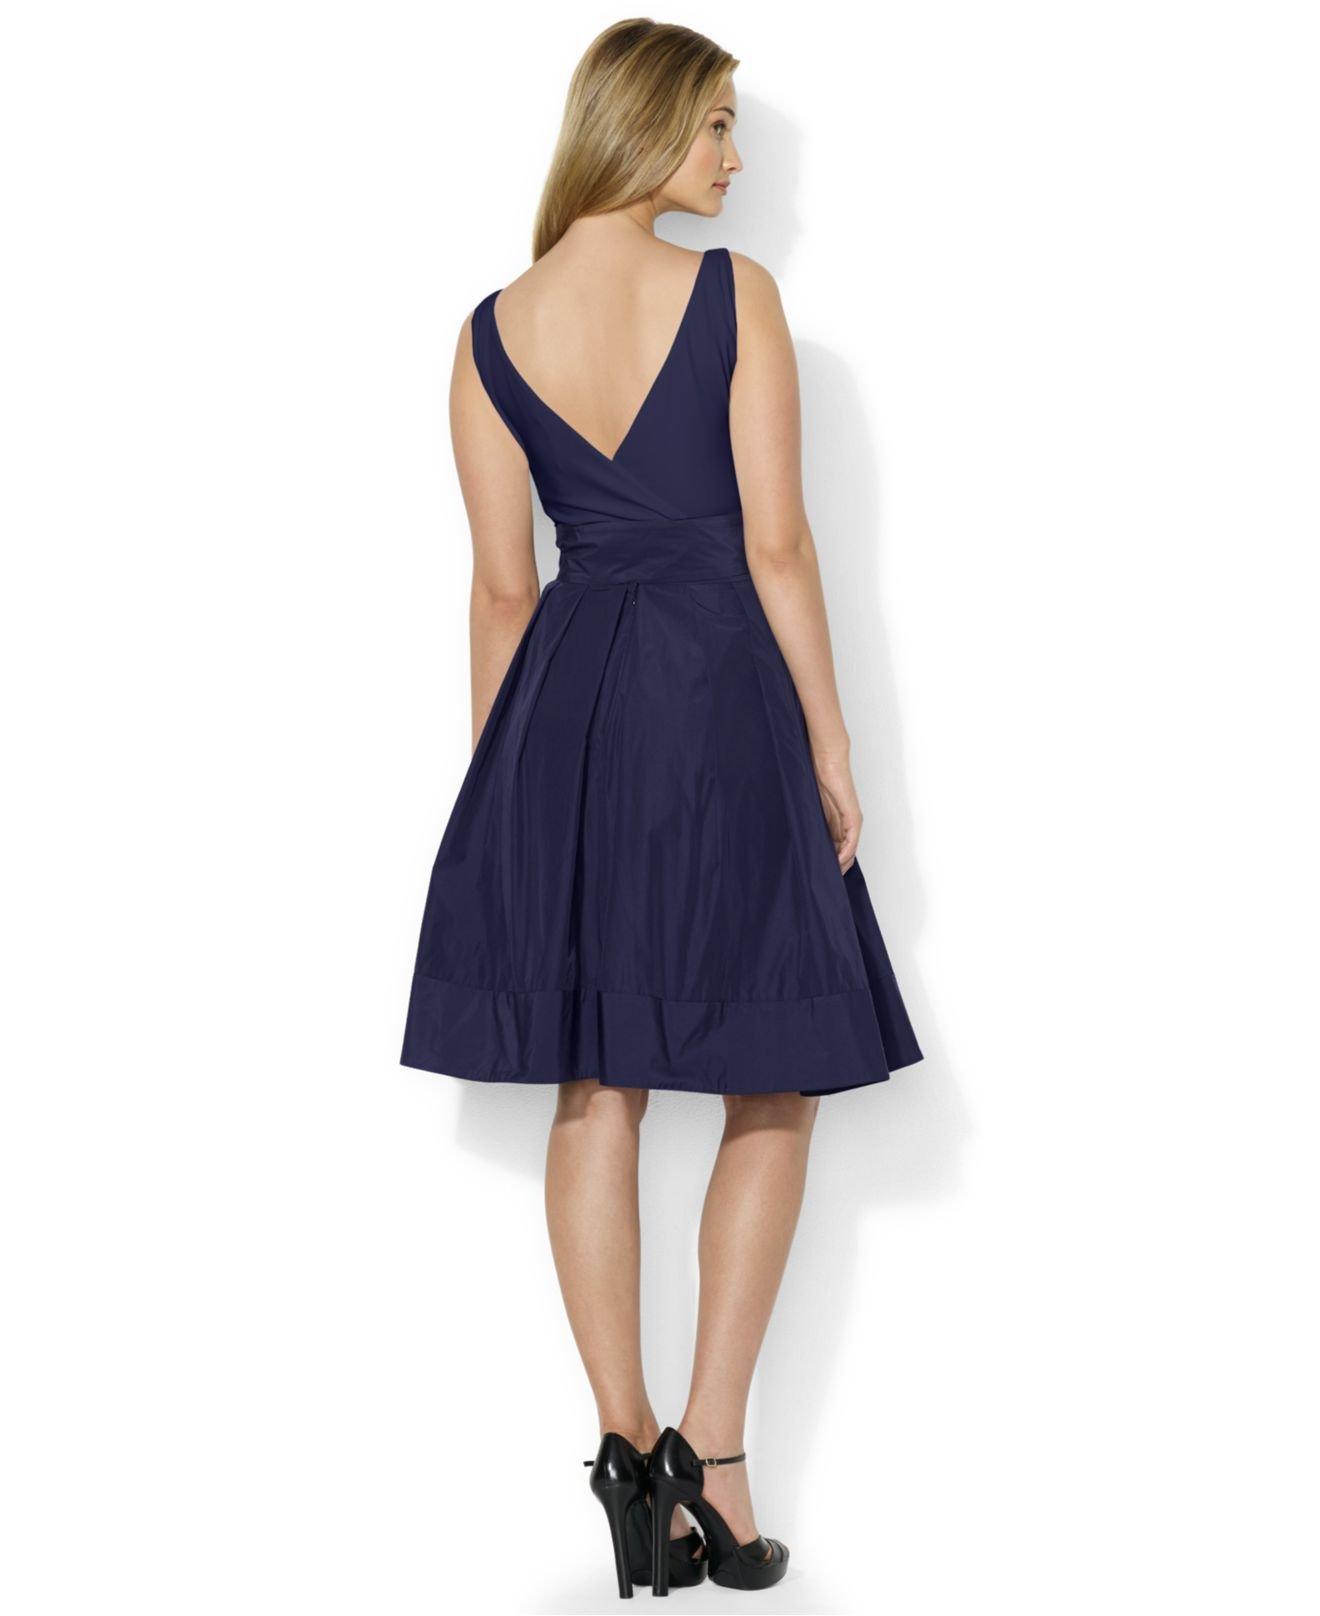 Lyst - Lauren By Ralph Lauren Petite Pleated Cocktail Dress in Blue